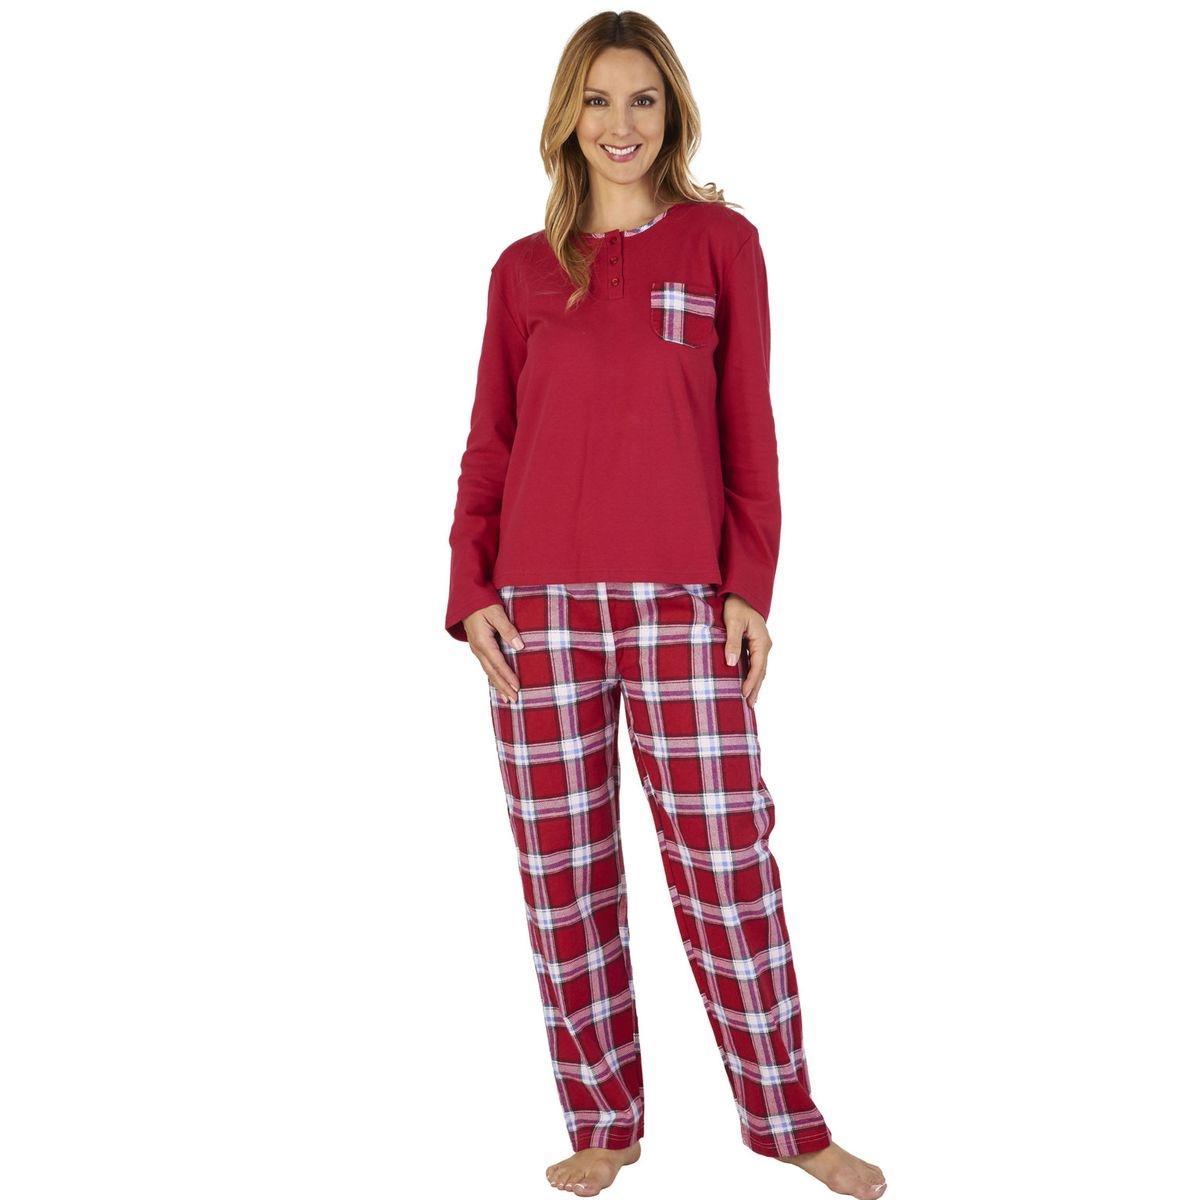 Ensemble de Pyjama